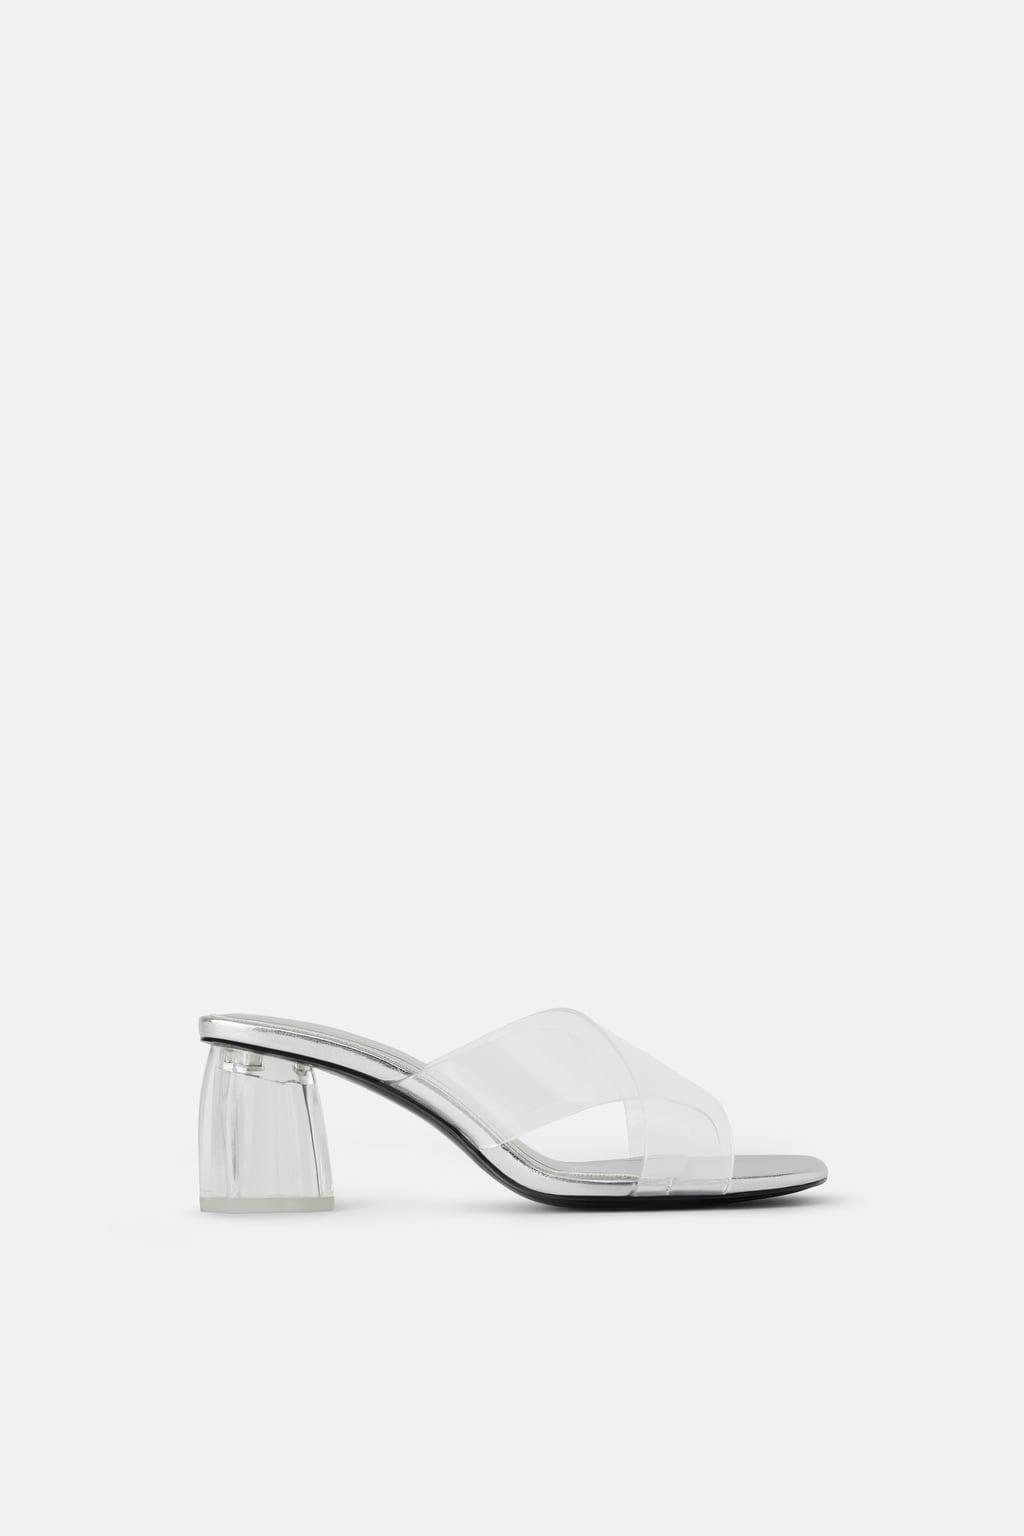 De Más Zara Mujer Moda TransparentesLos Zapatos Sandalias UqSpMVz